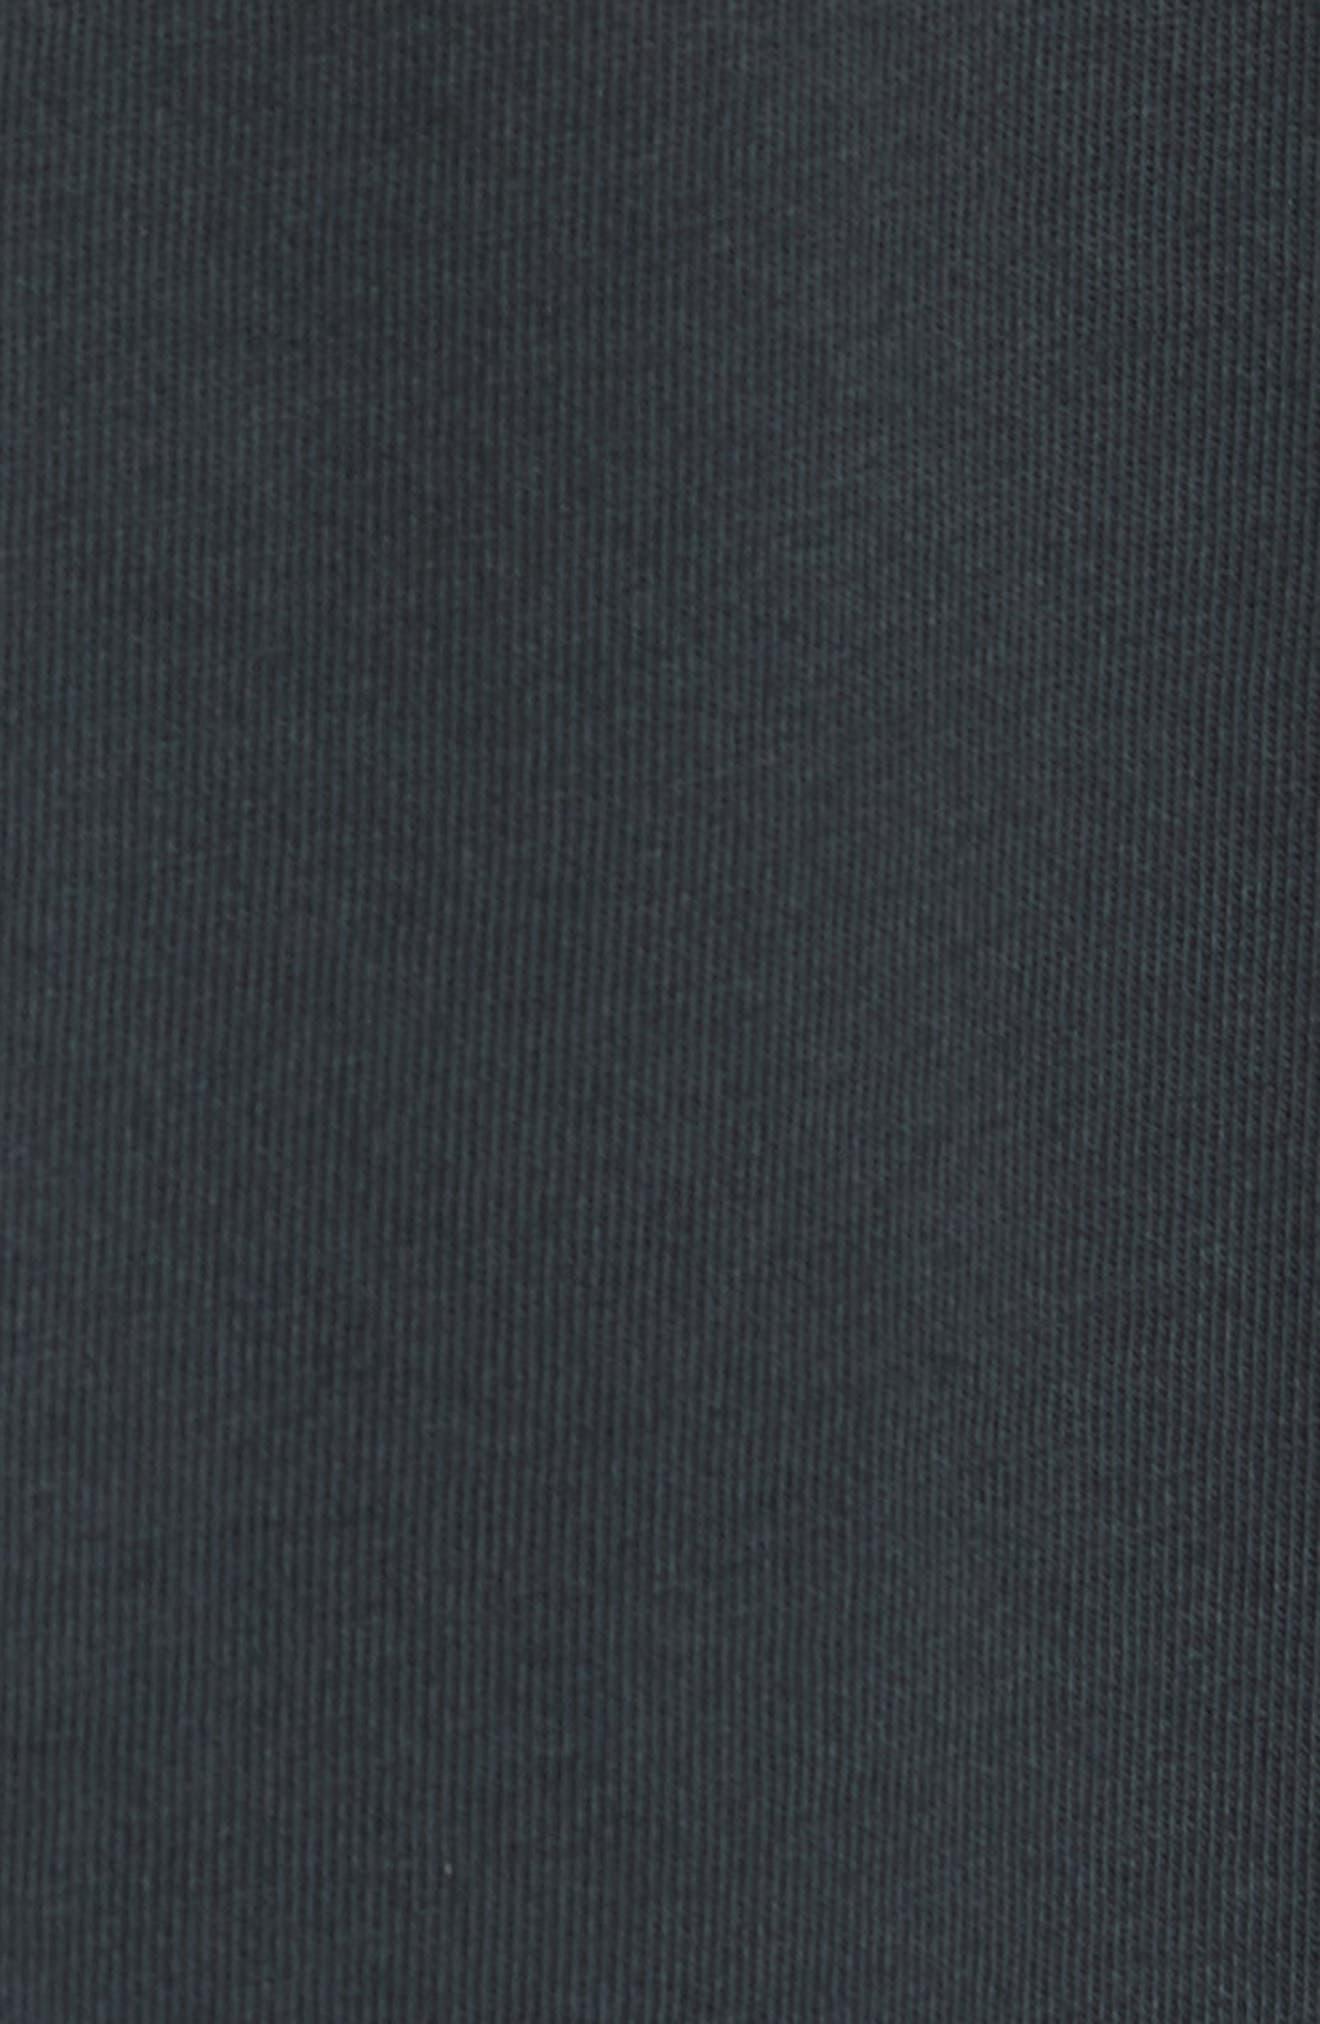 Dylan Desire T-Shirt,                             Alternate thumbnail 5, color,                             DUSTY BLACK